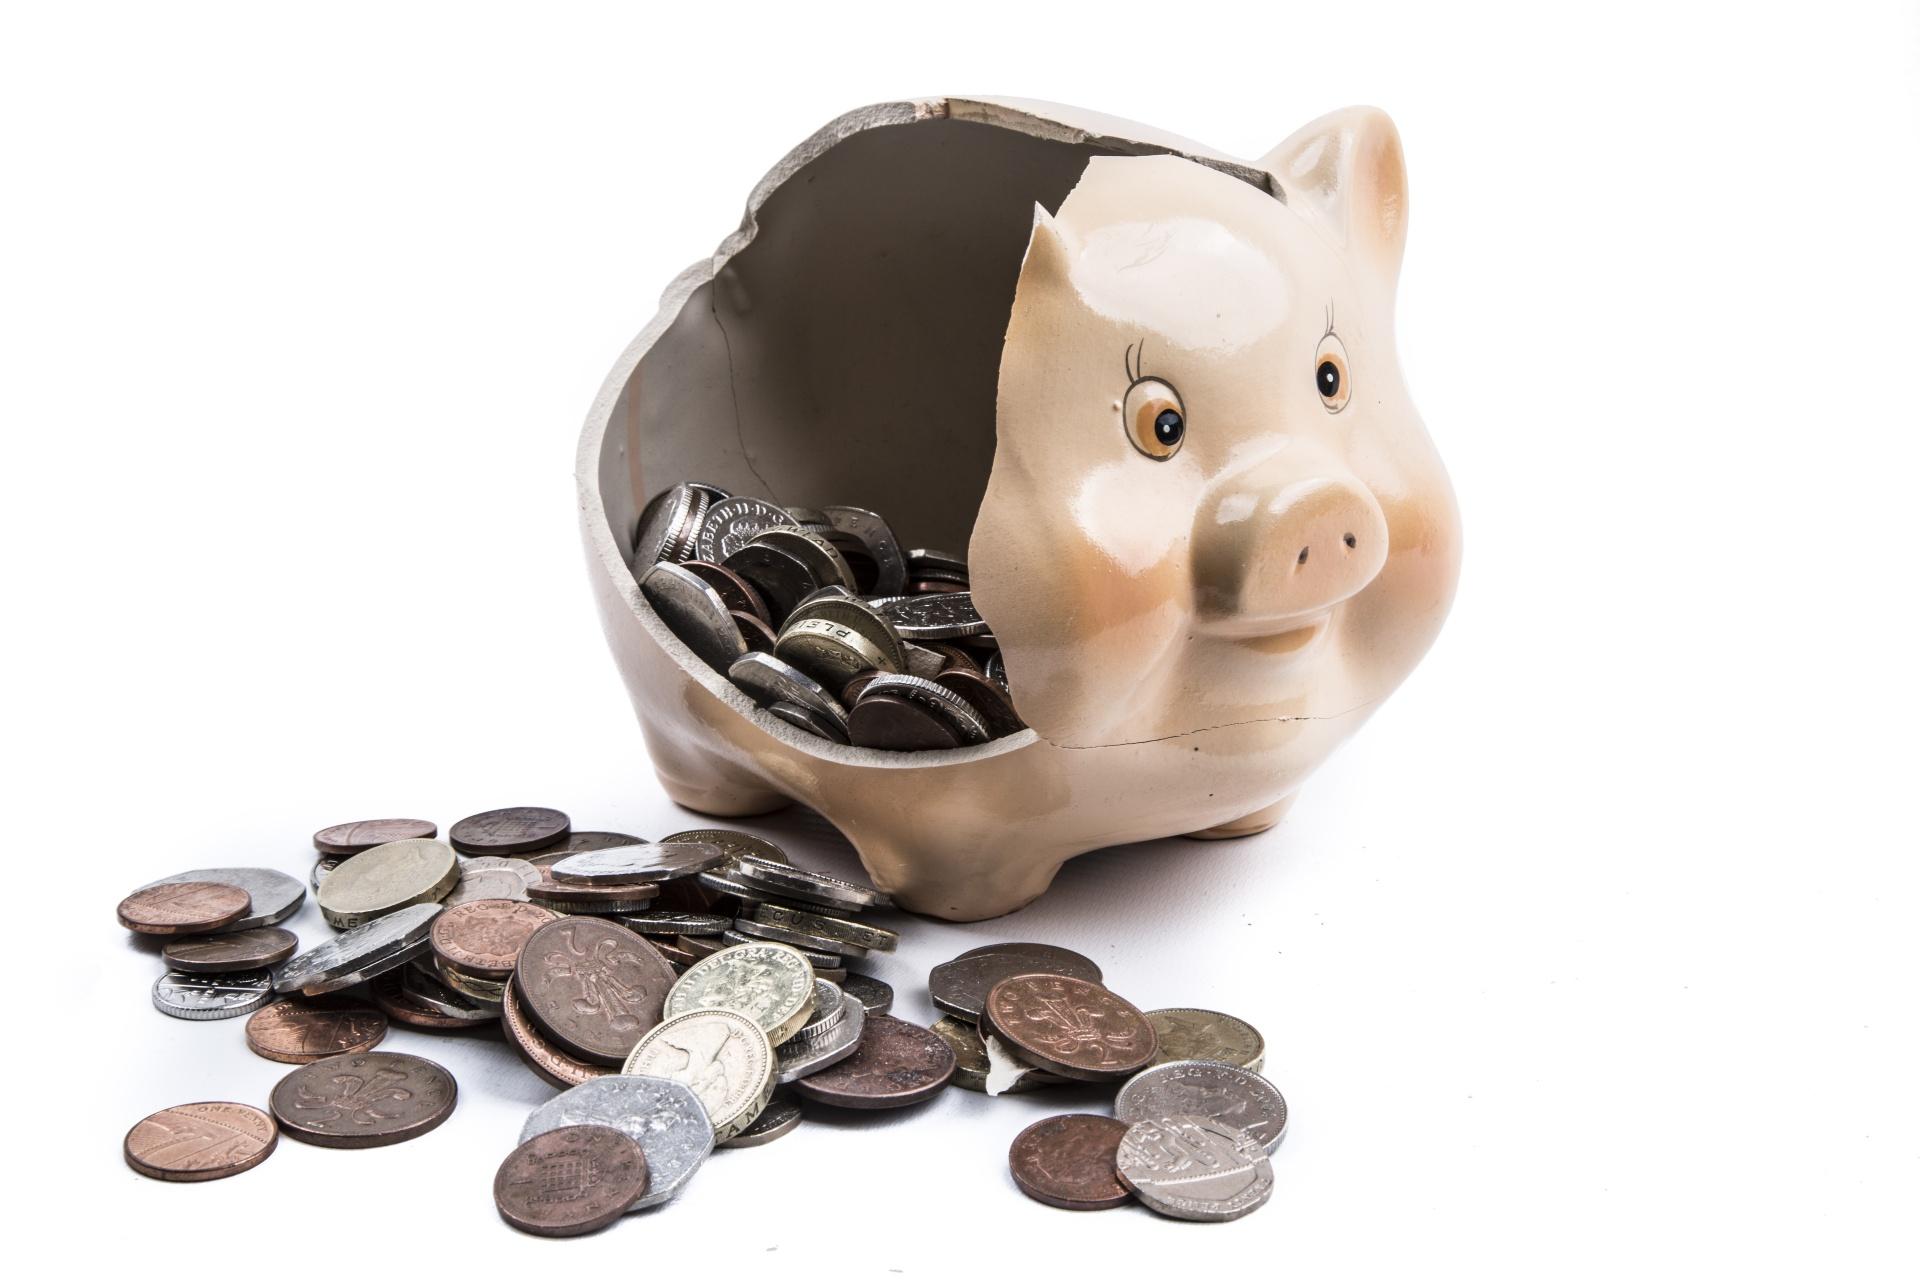 broken-piggy-bank - Trading Game